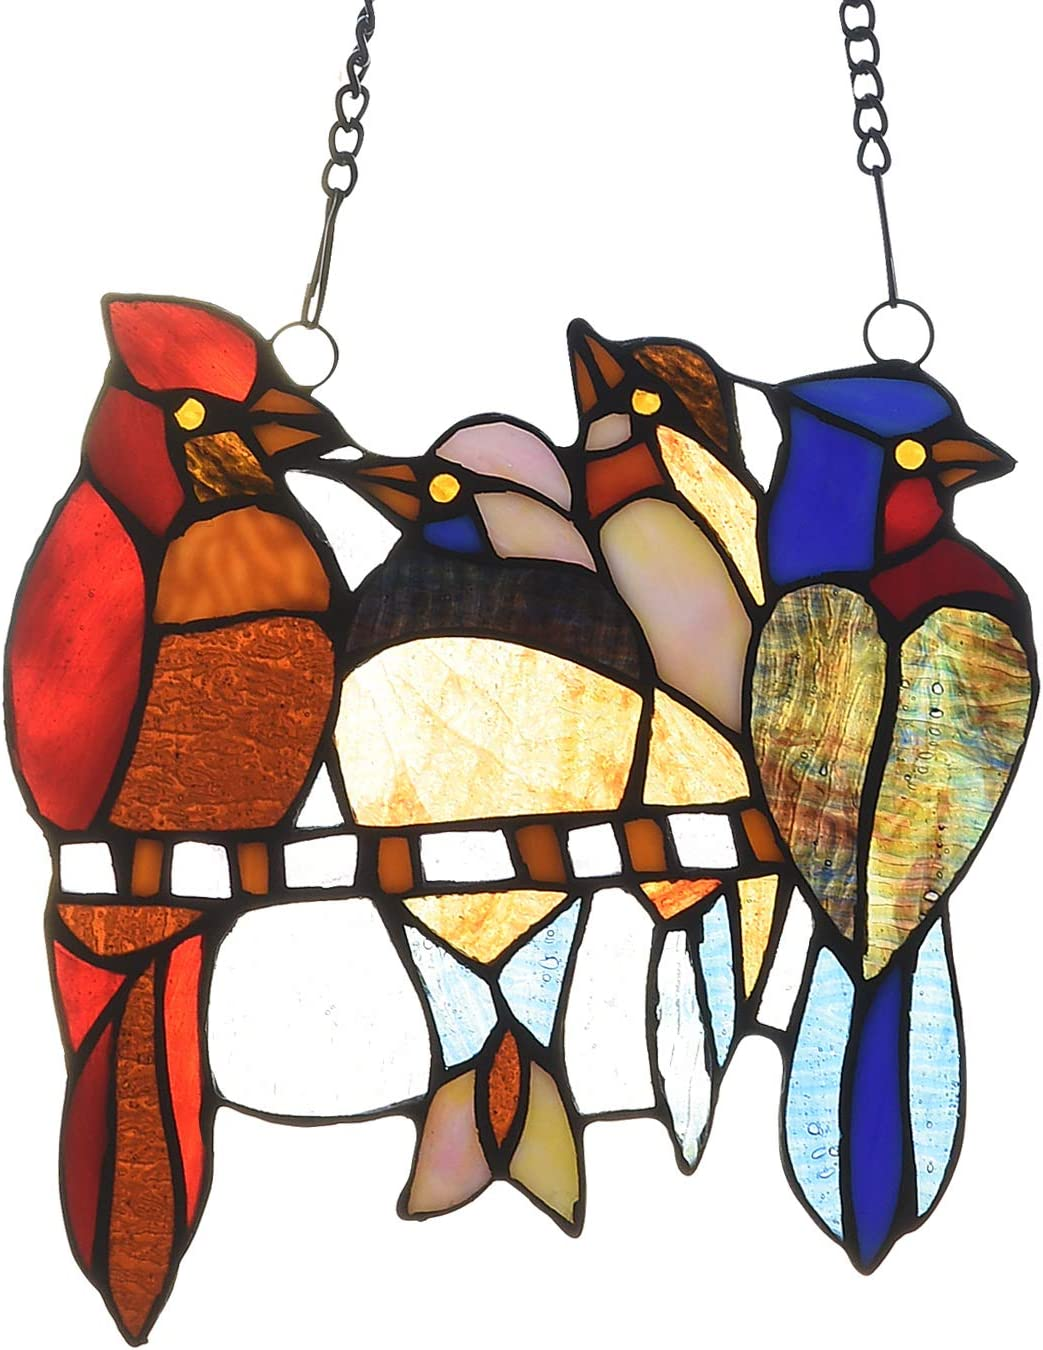 Capulina Stained Glass Window Hangings 4 Birds 9 Inches Wide Window Panels Handmade Tiffany Art Craft Sun Catcher